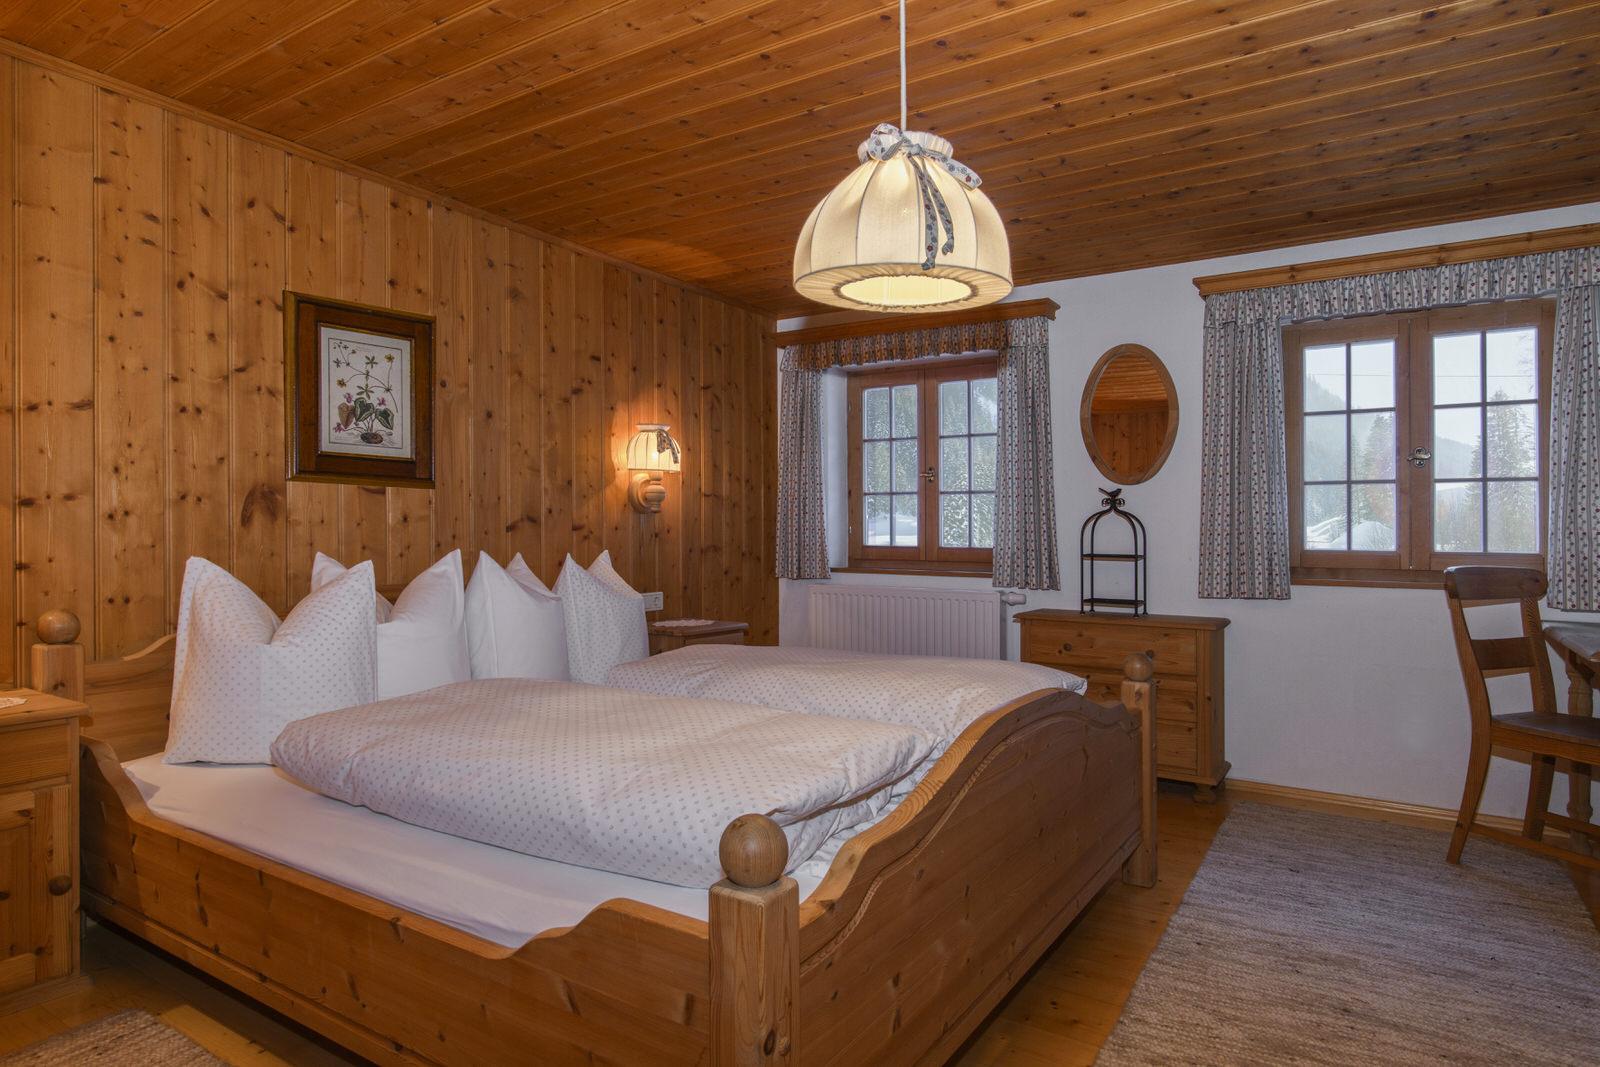 Bärenwald country lodge in the Montafon - sleeping